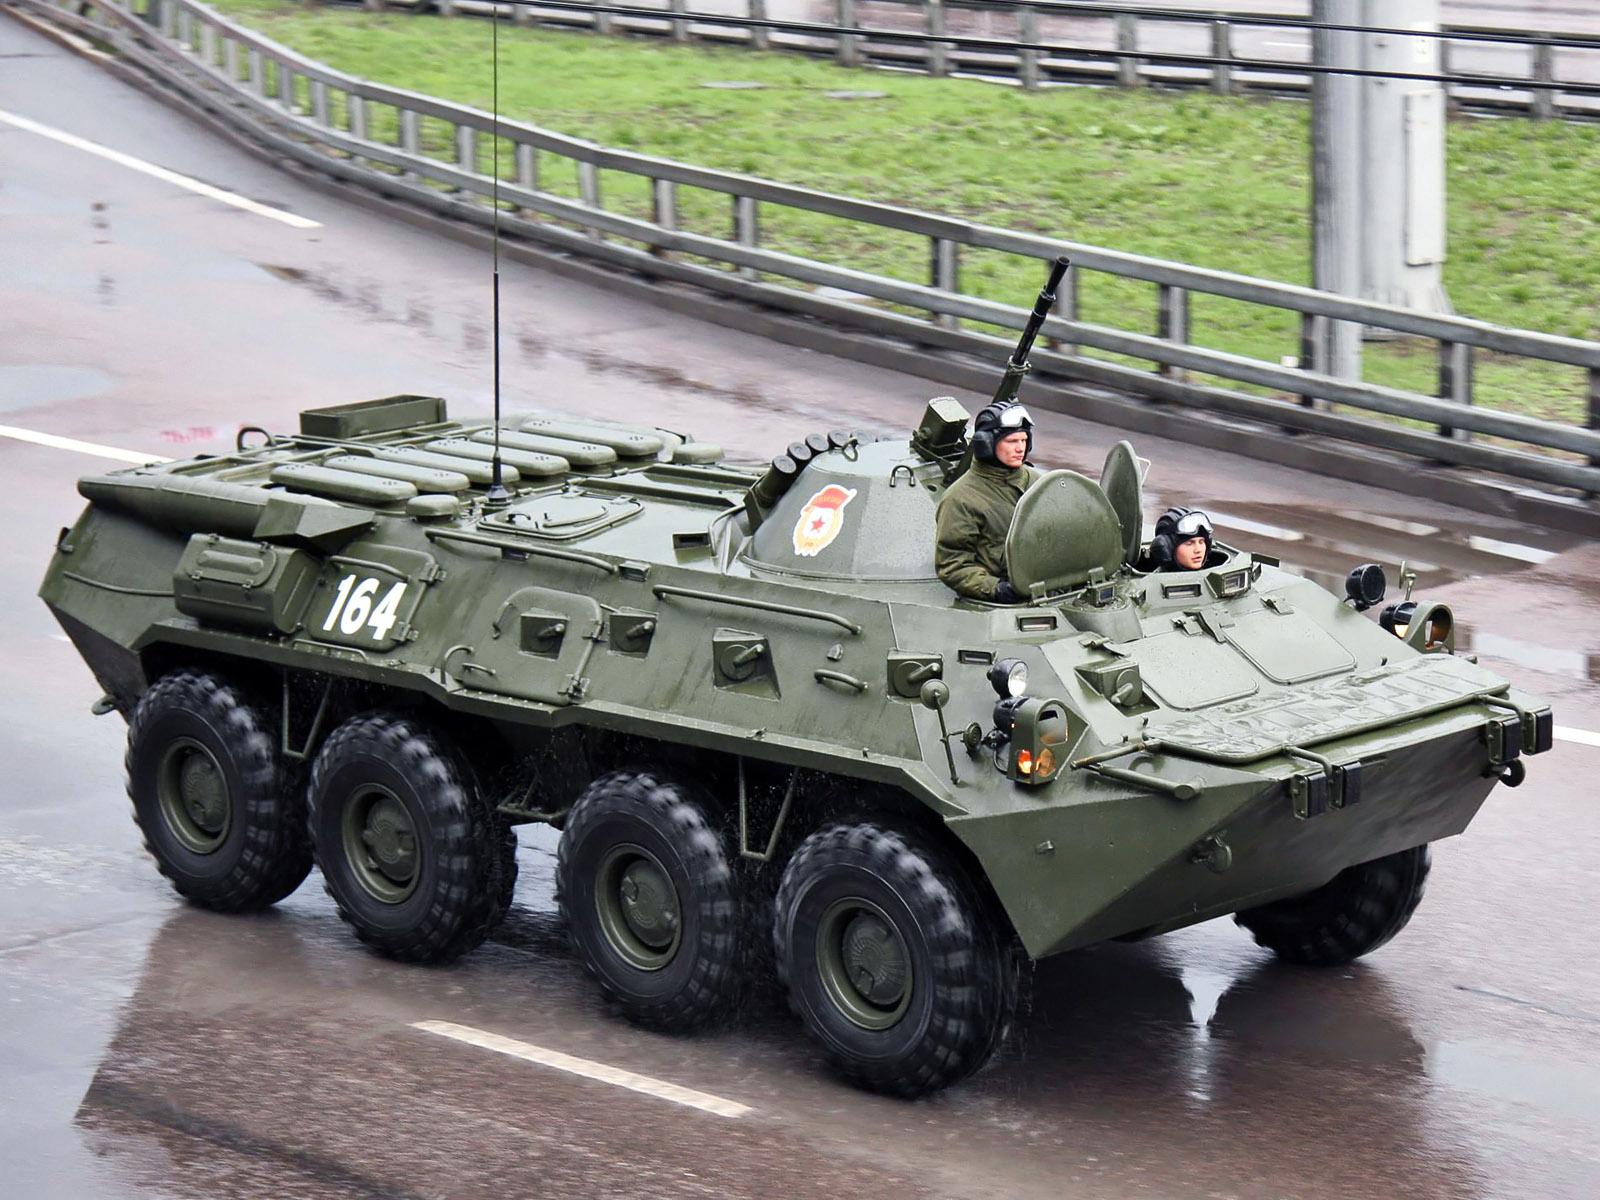 1984 GAZ 5903 BTR 80 military 8-0 h wallpaper | 1600x1200 | 214756